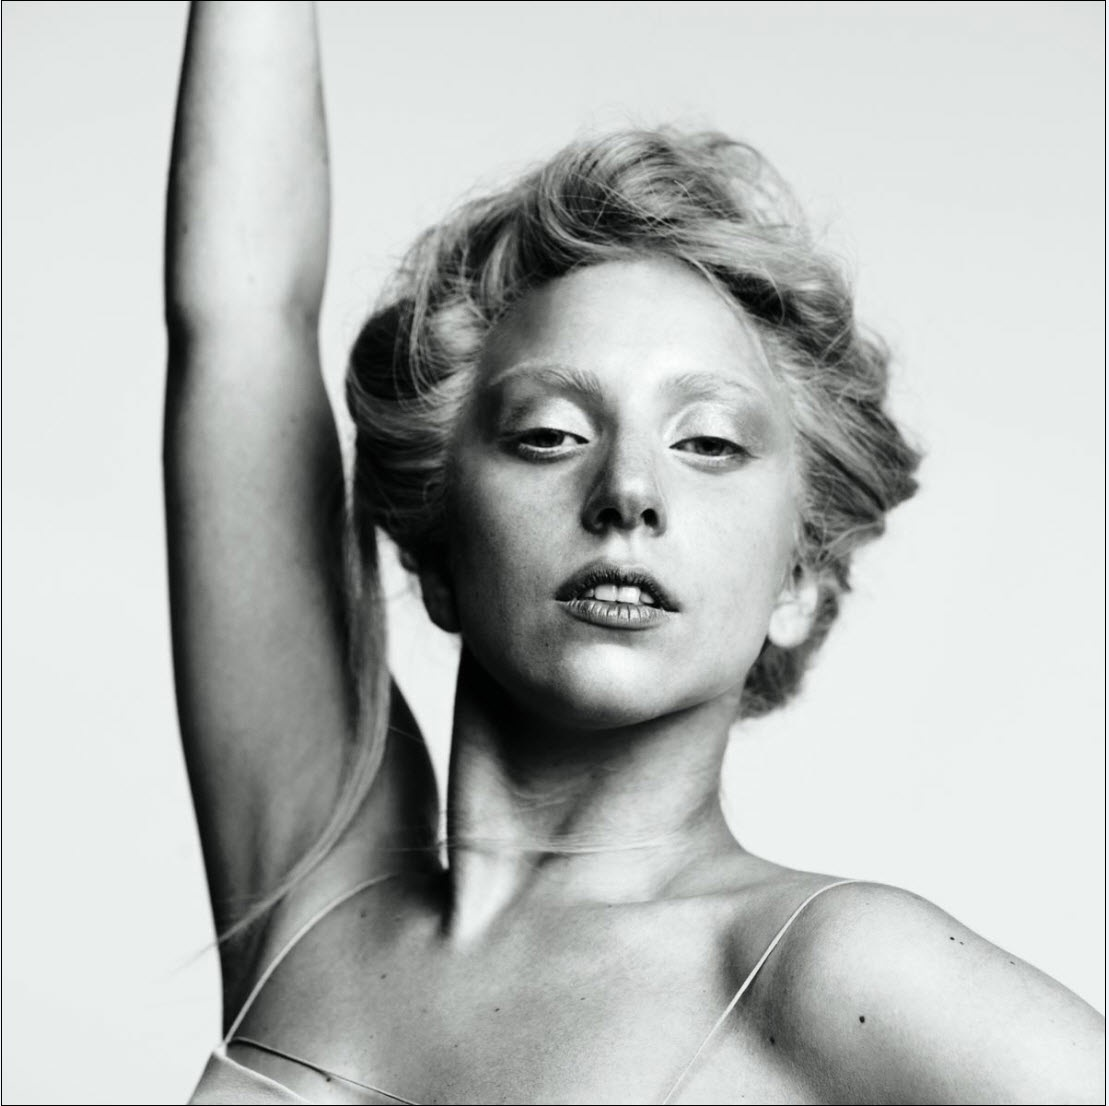 Lady Gaga body image